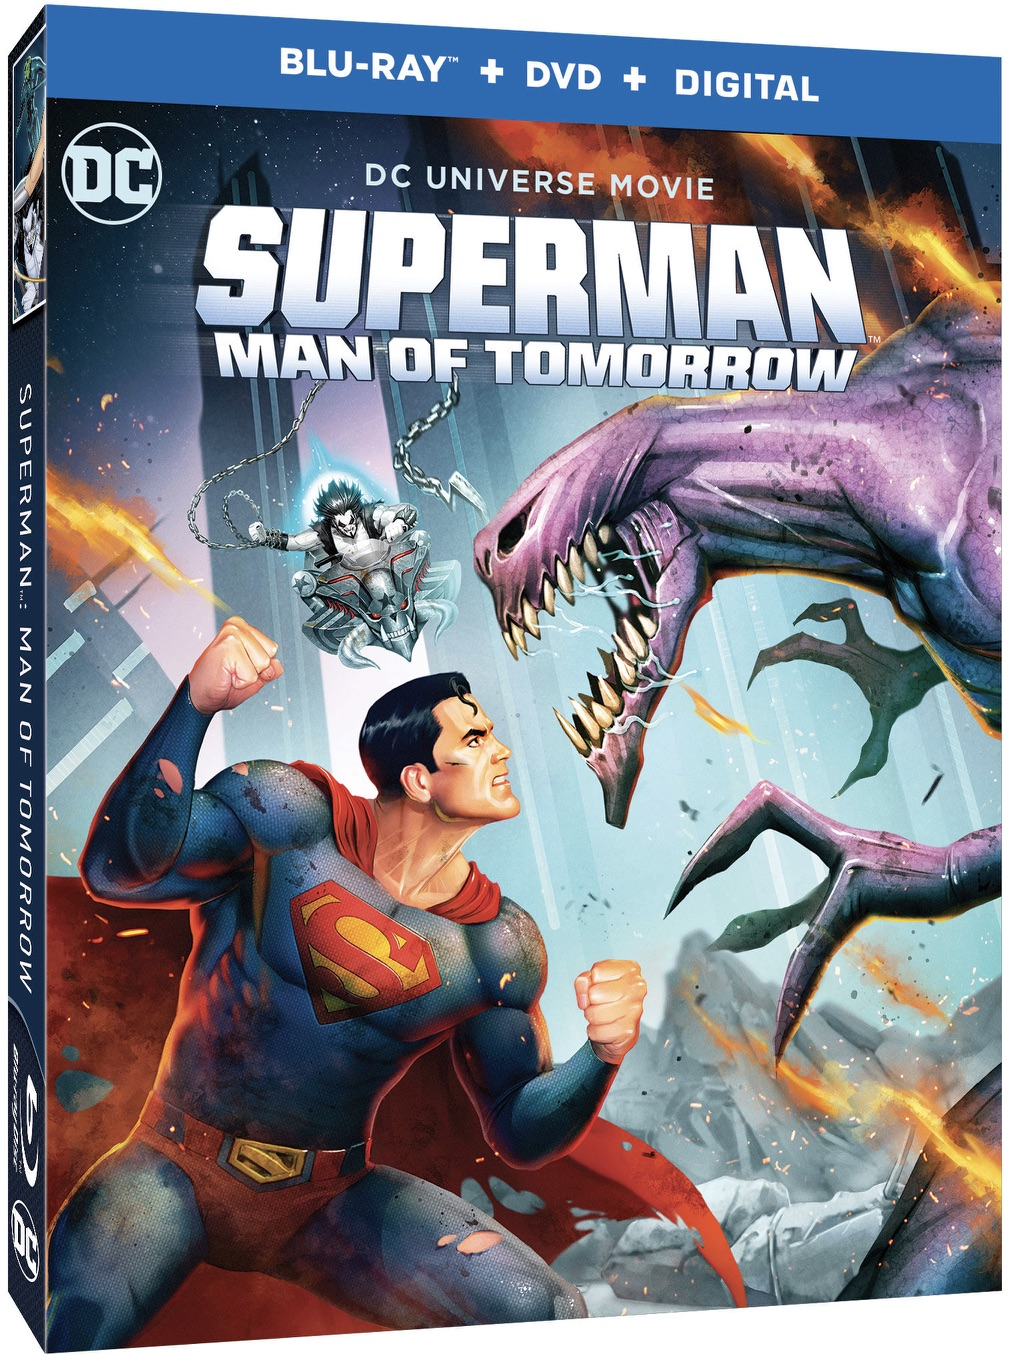 Superman: Man of Tomorrow Animated Movie